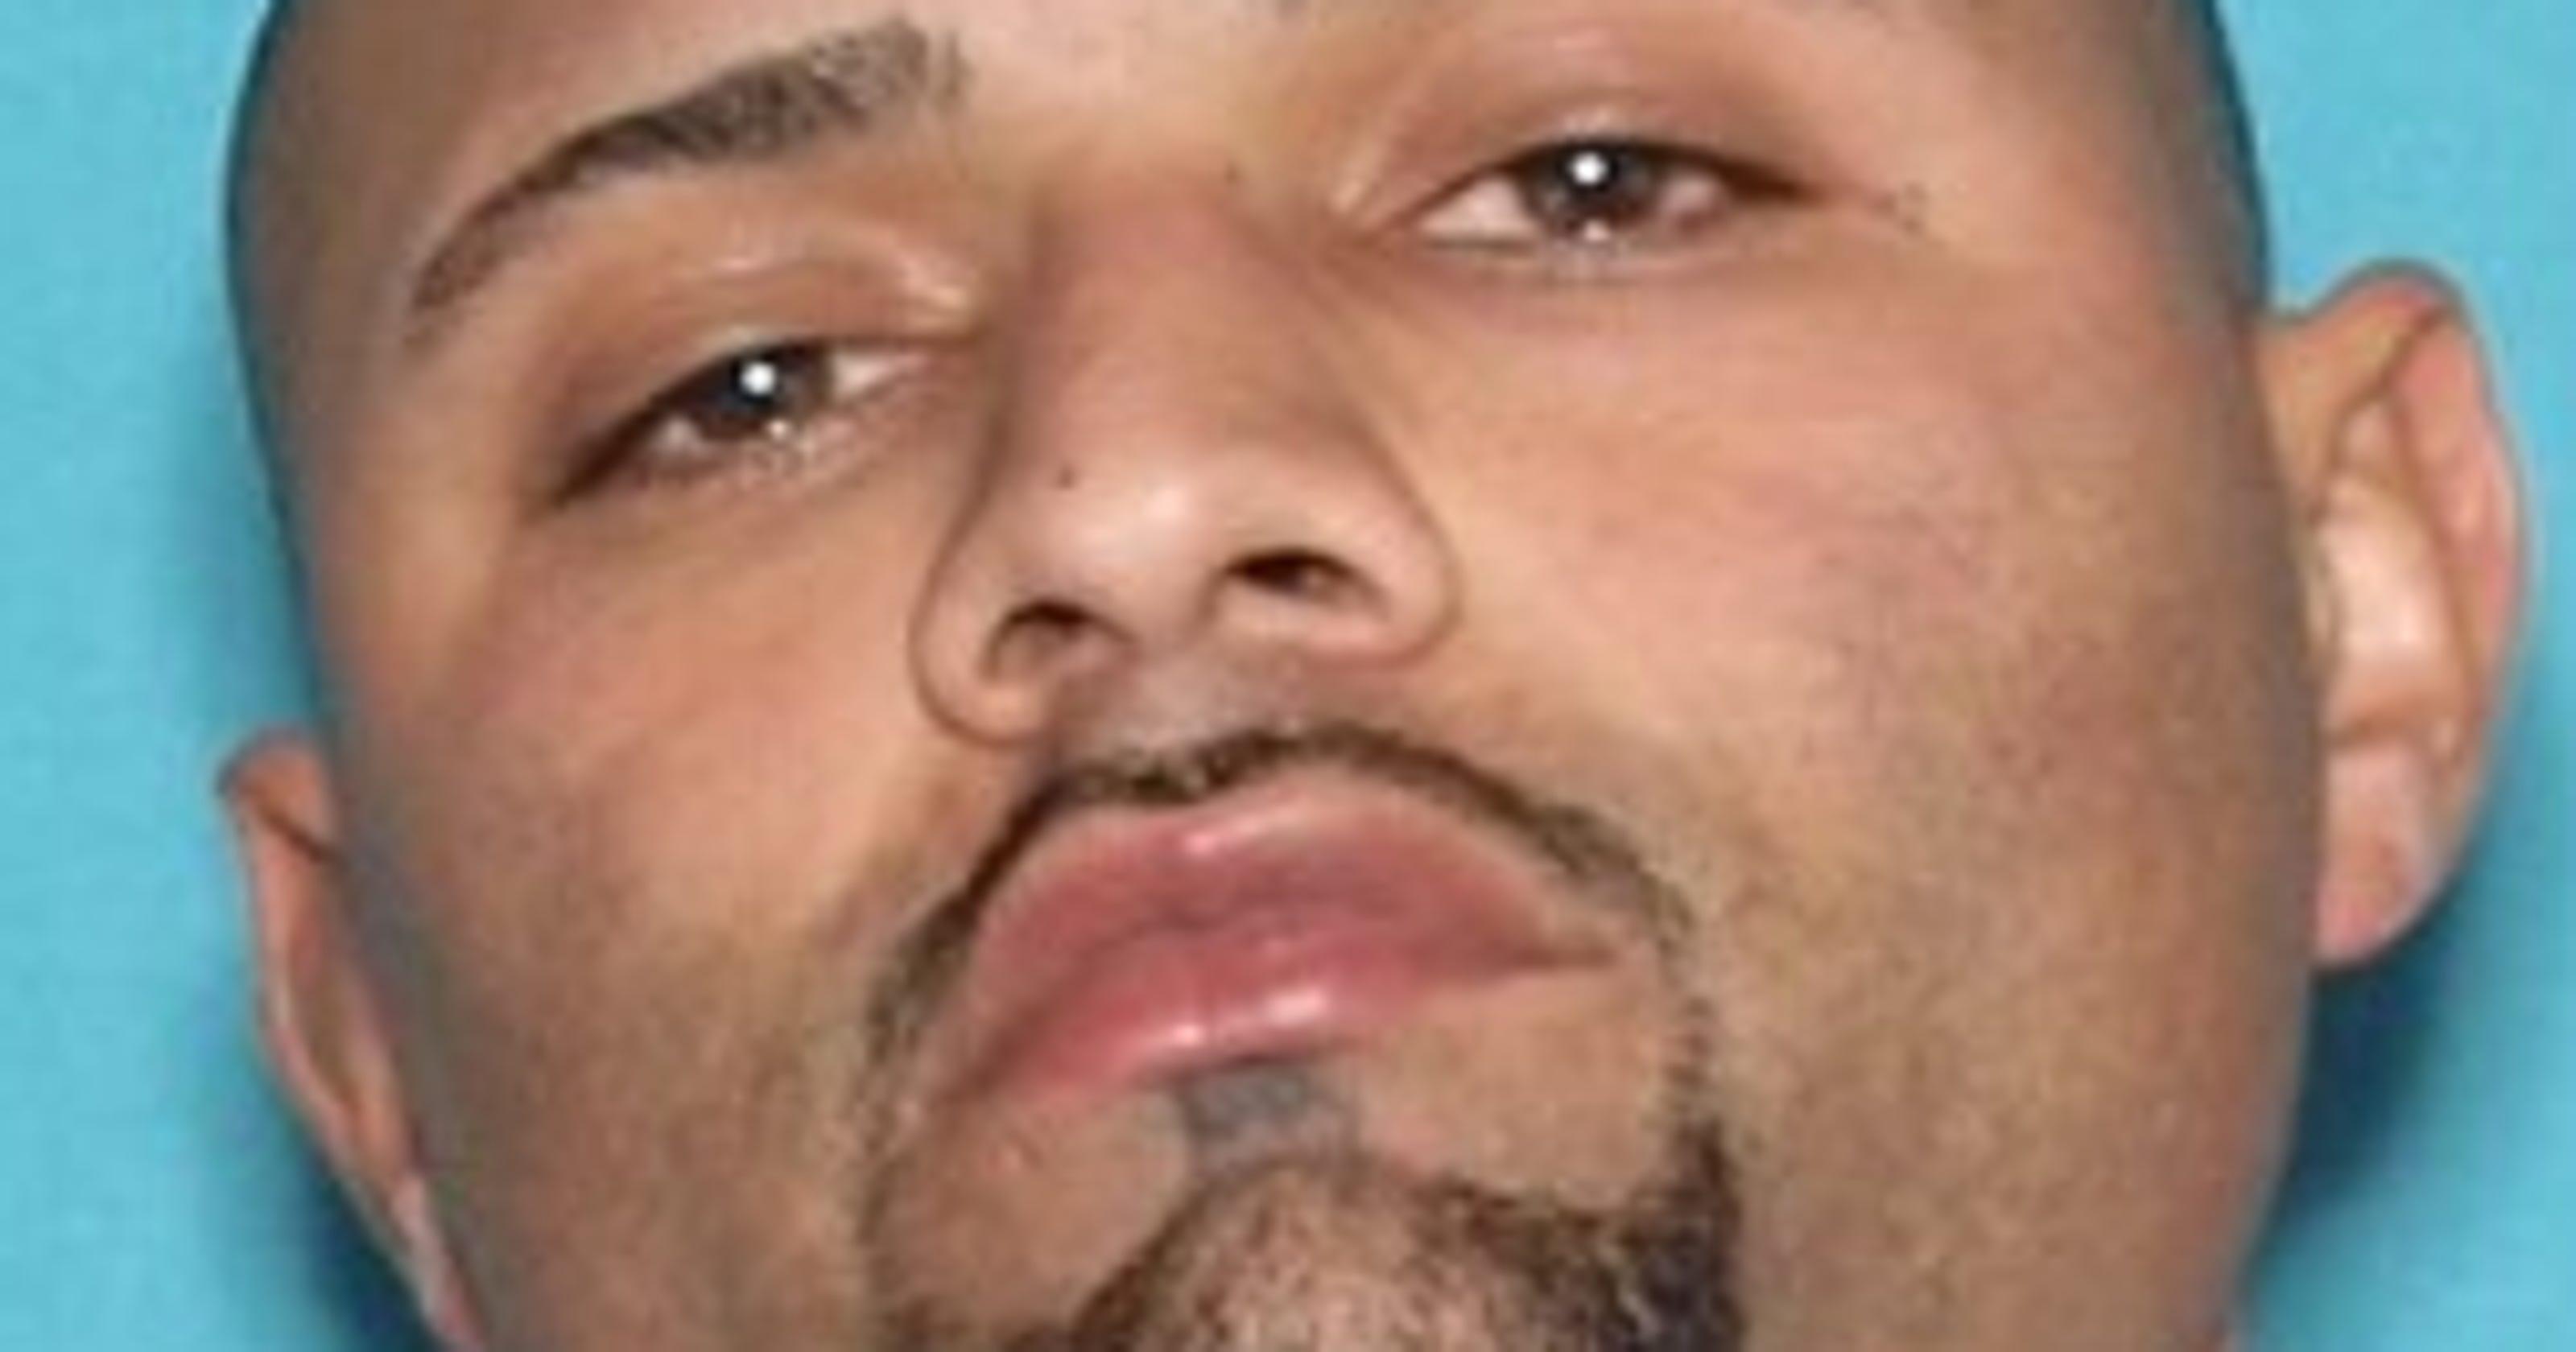 Oxnard transvestite boy murdered